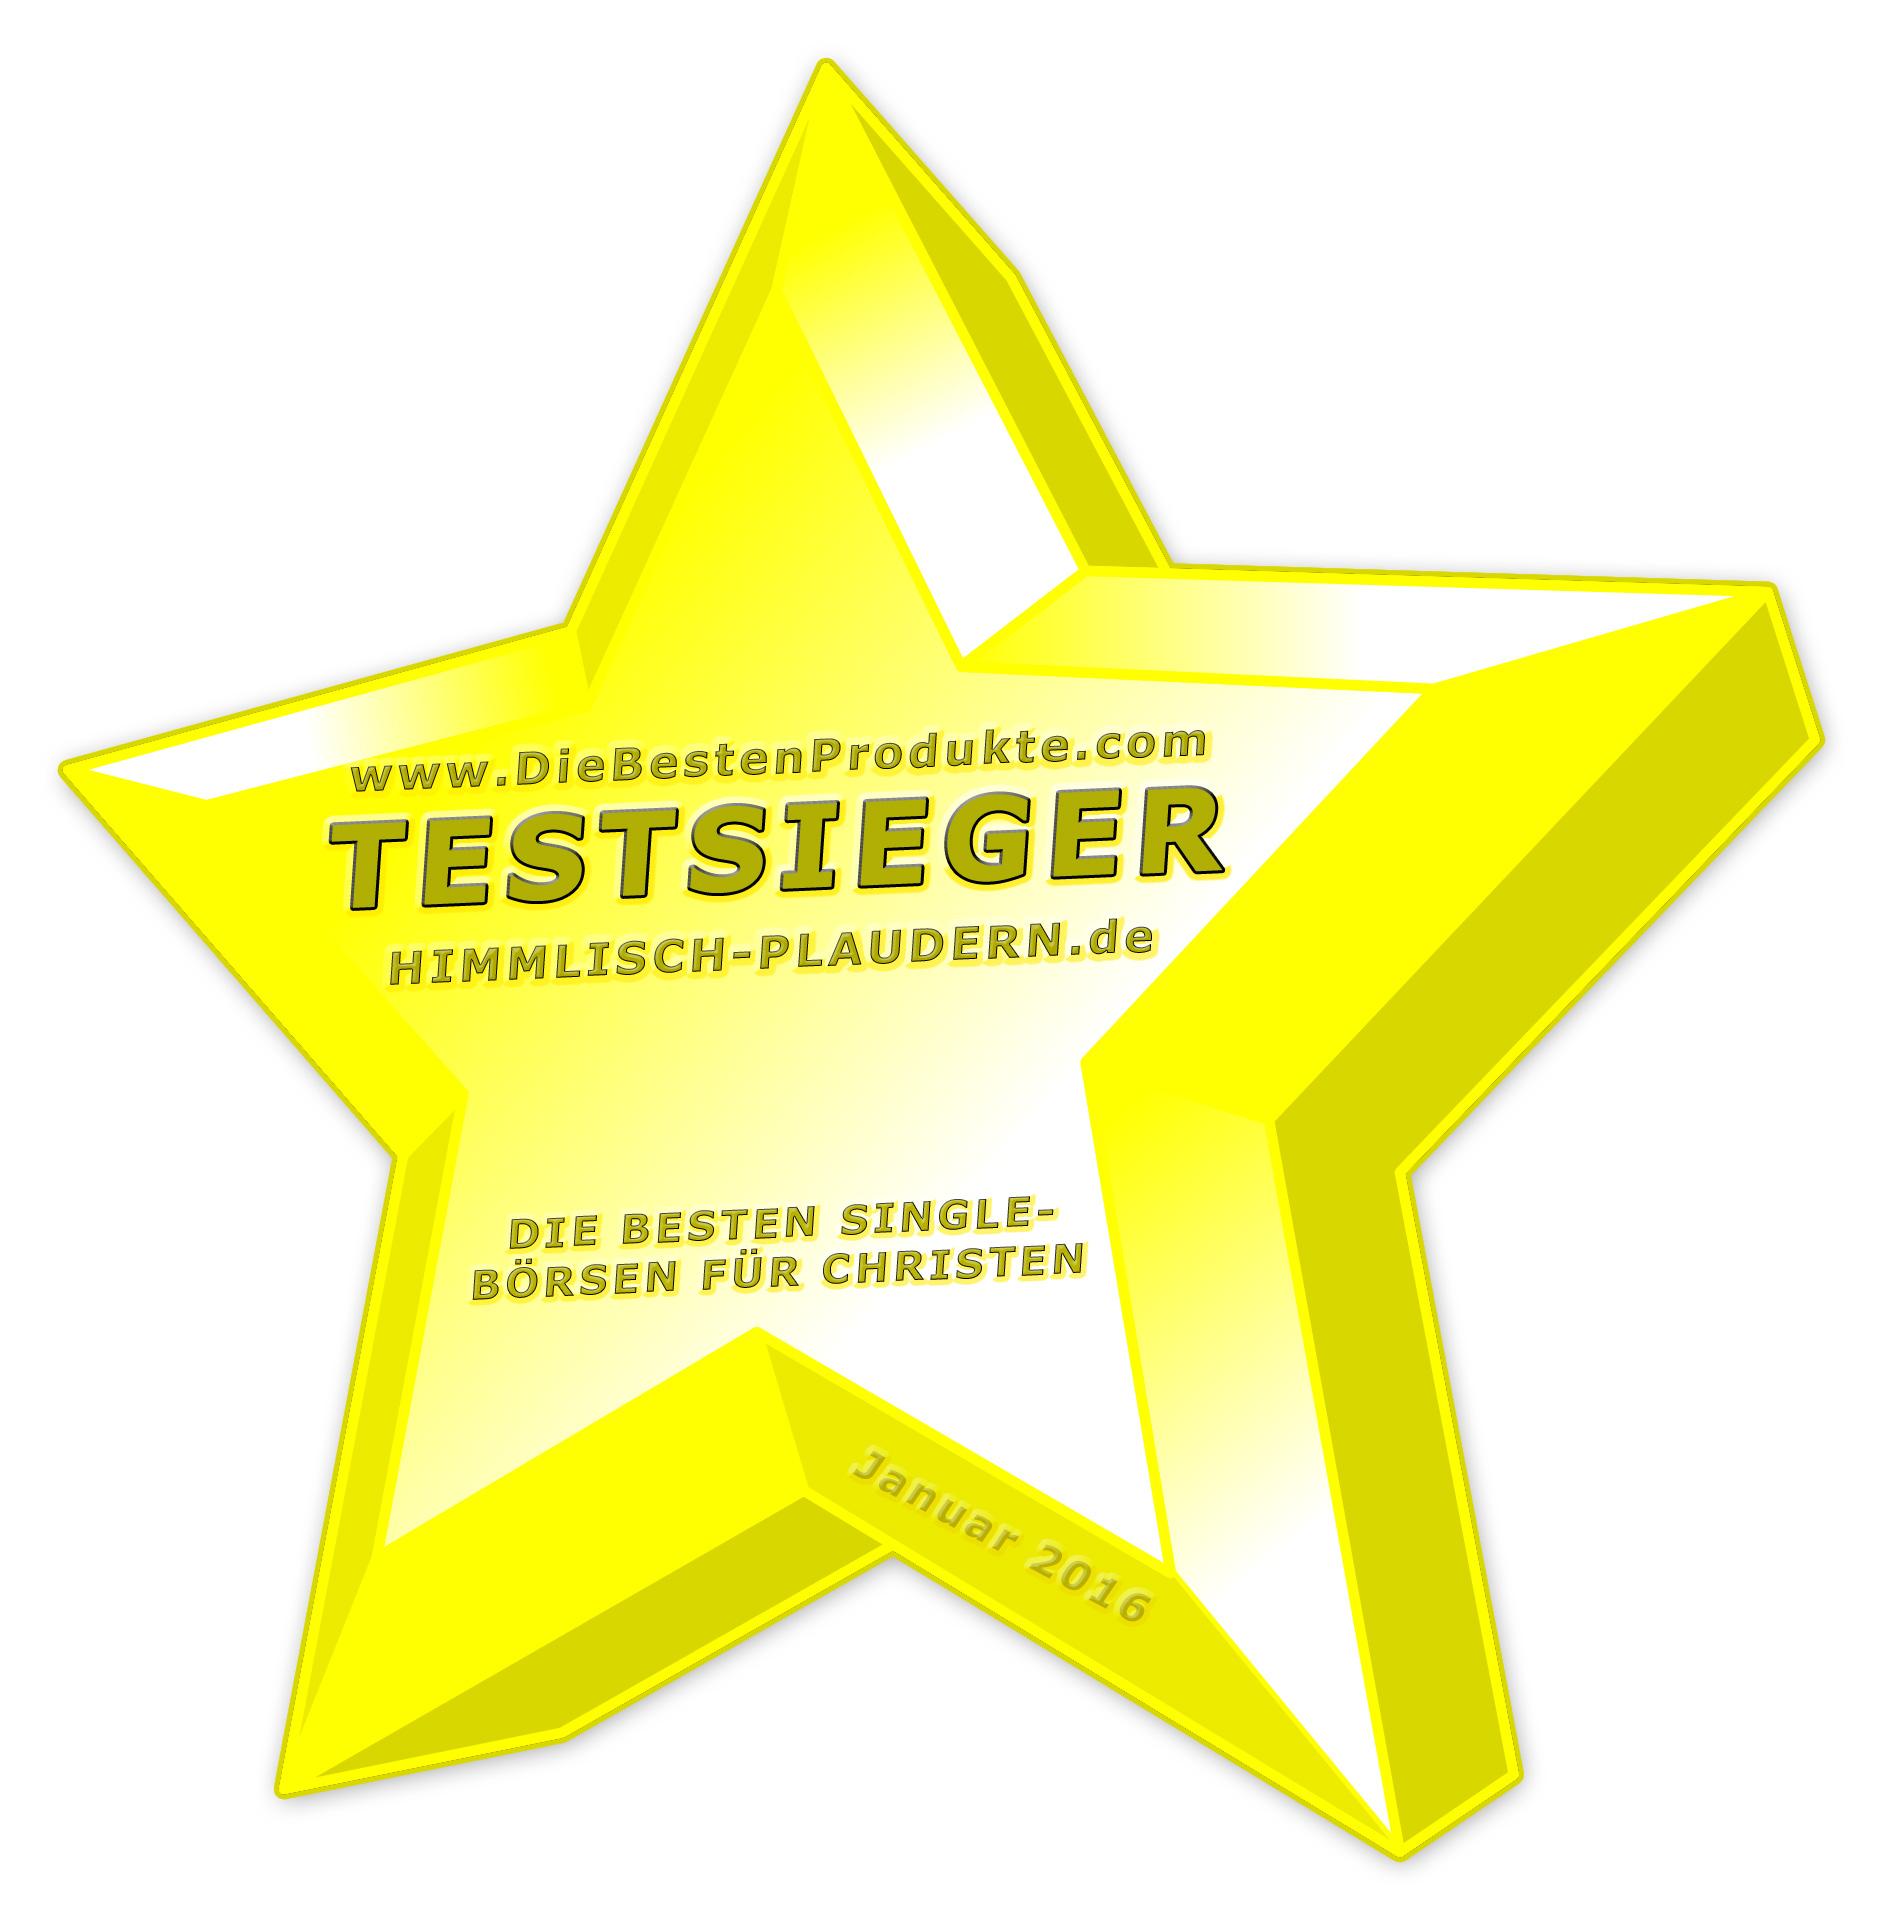 DBP-Award-Himmlisch-Plaudern